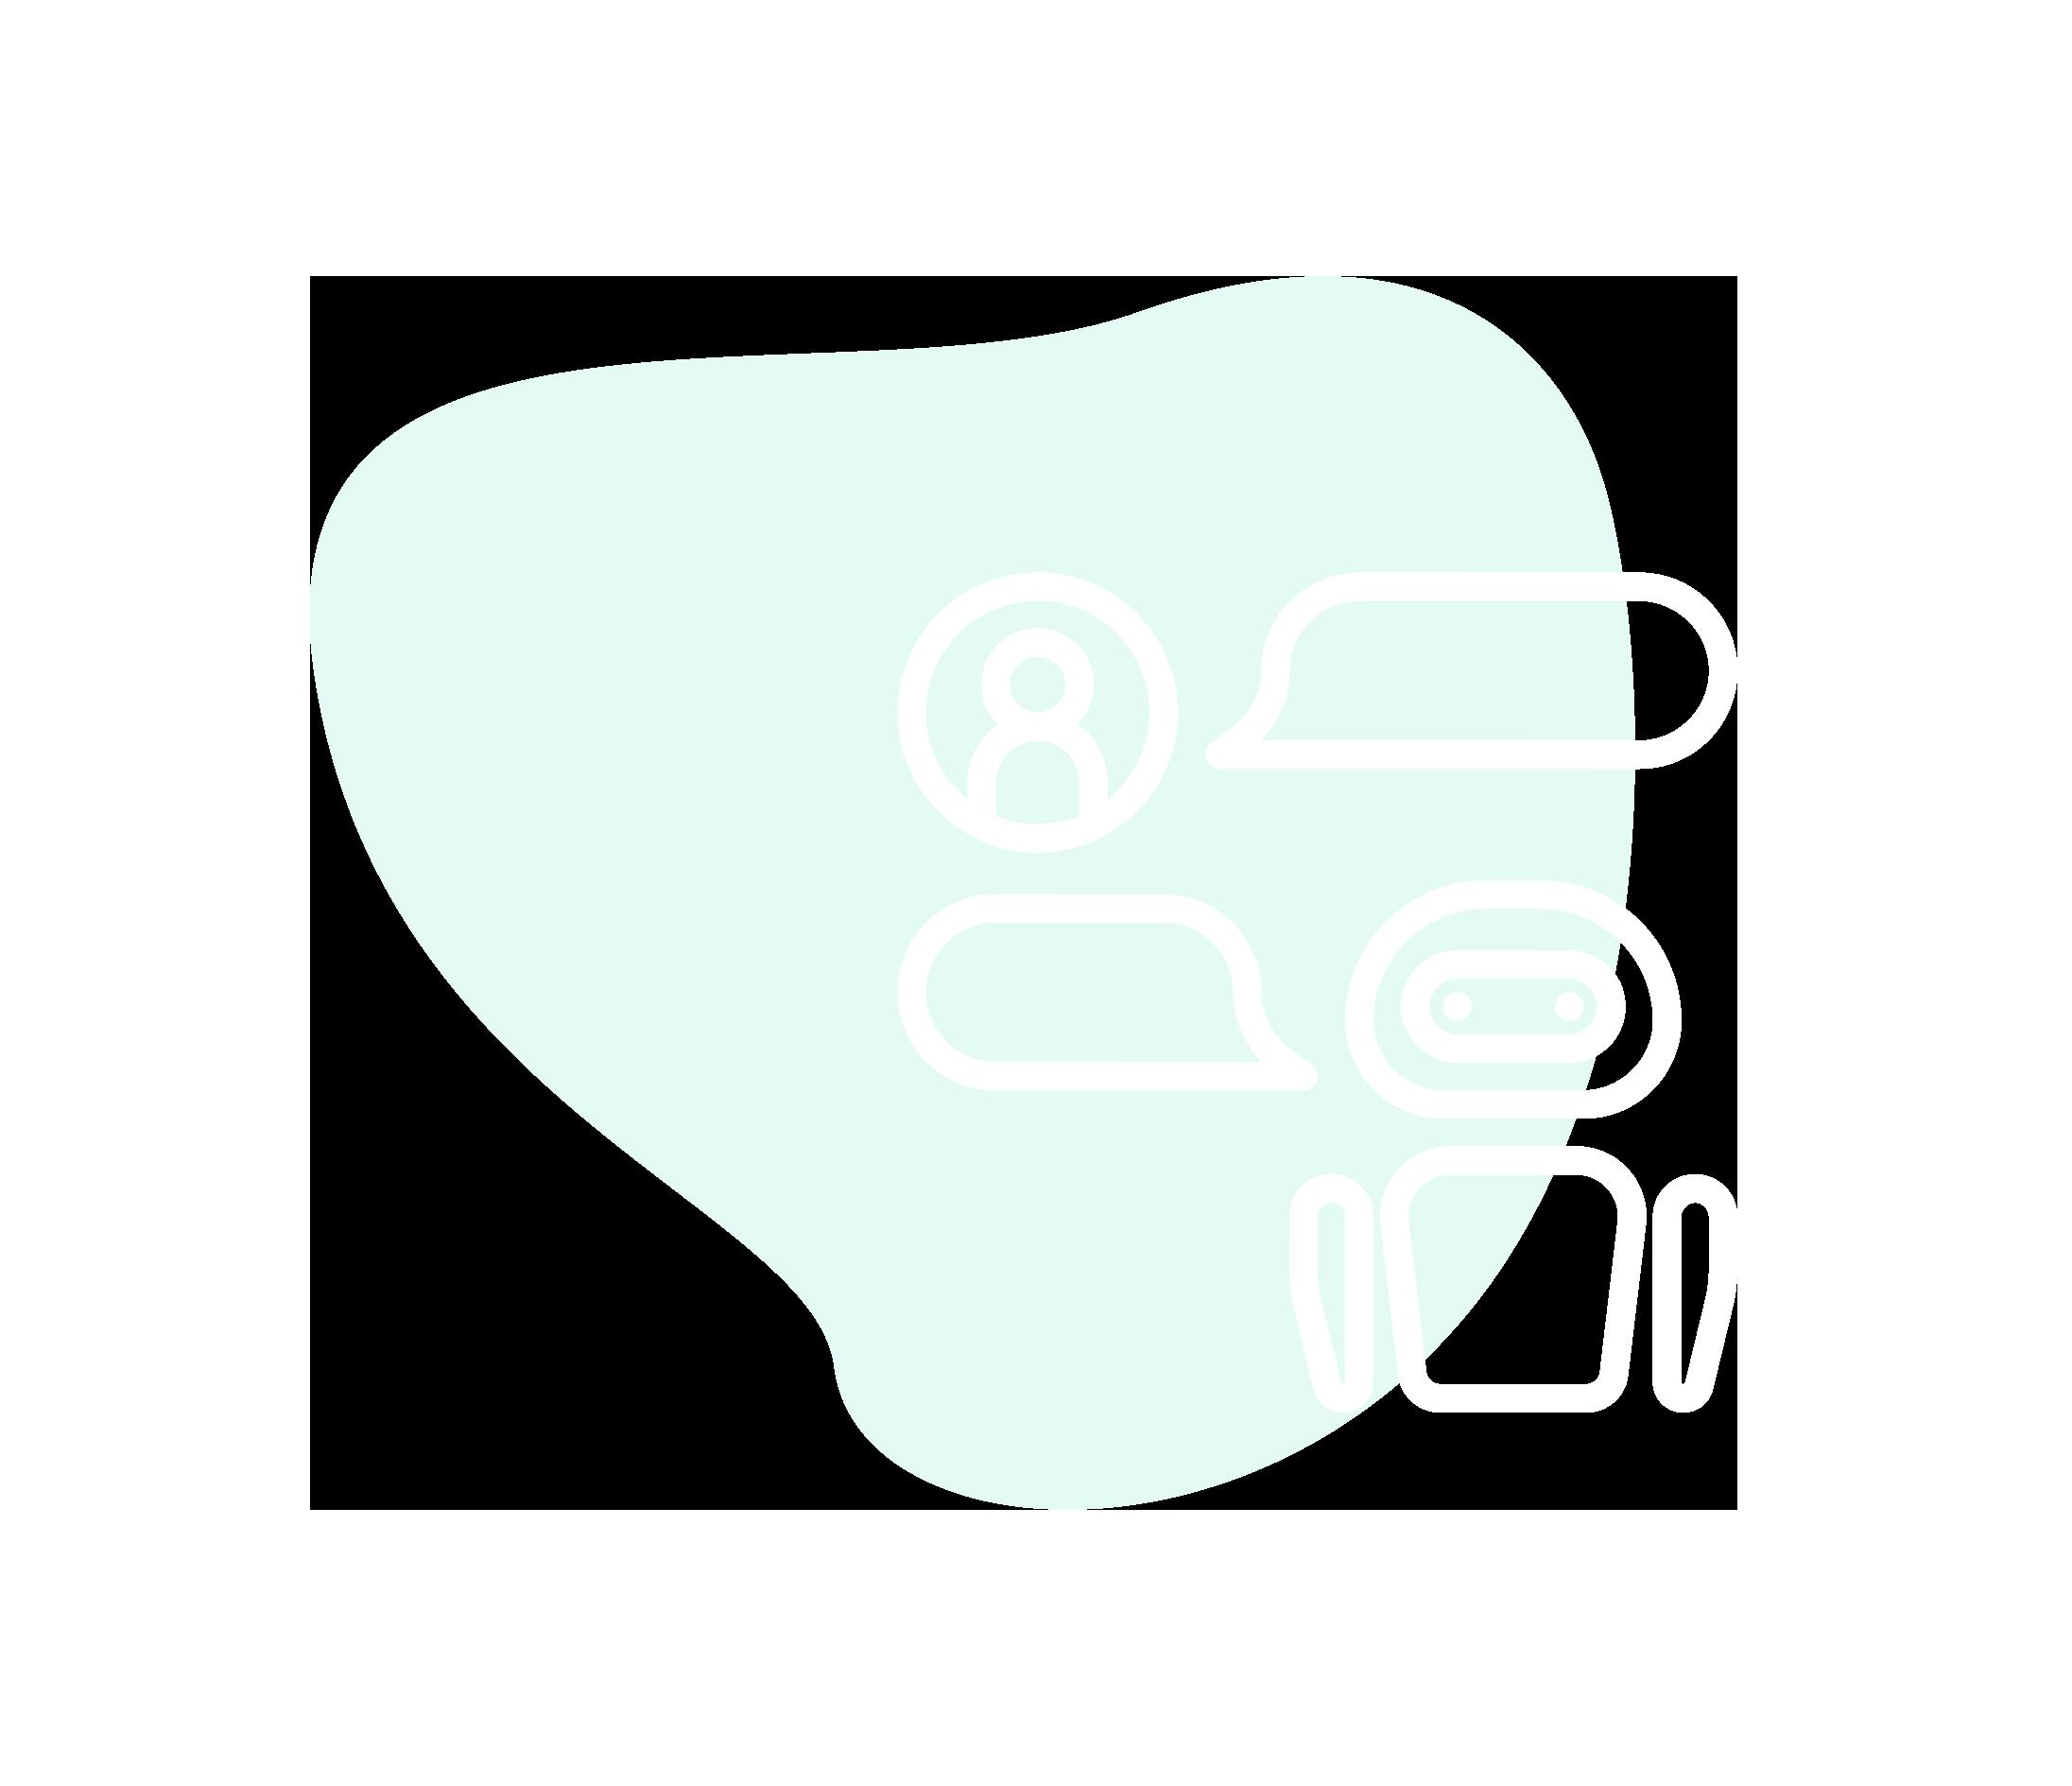 RemoteAdvisory_transparent_klein